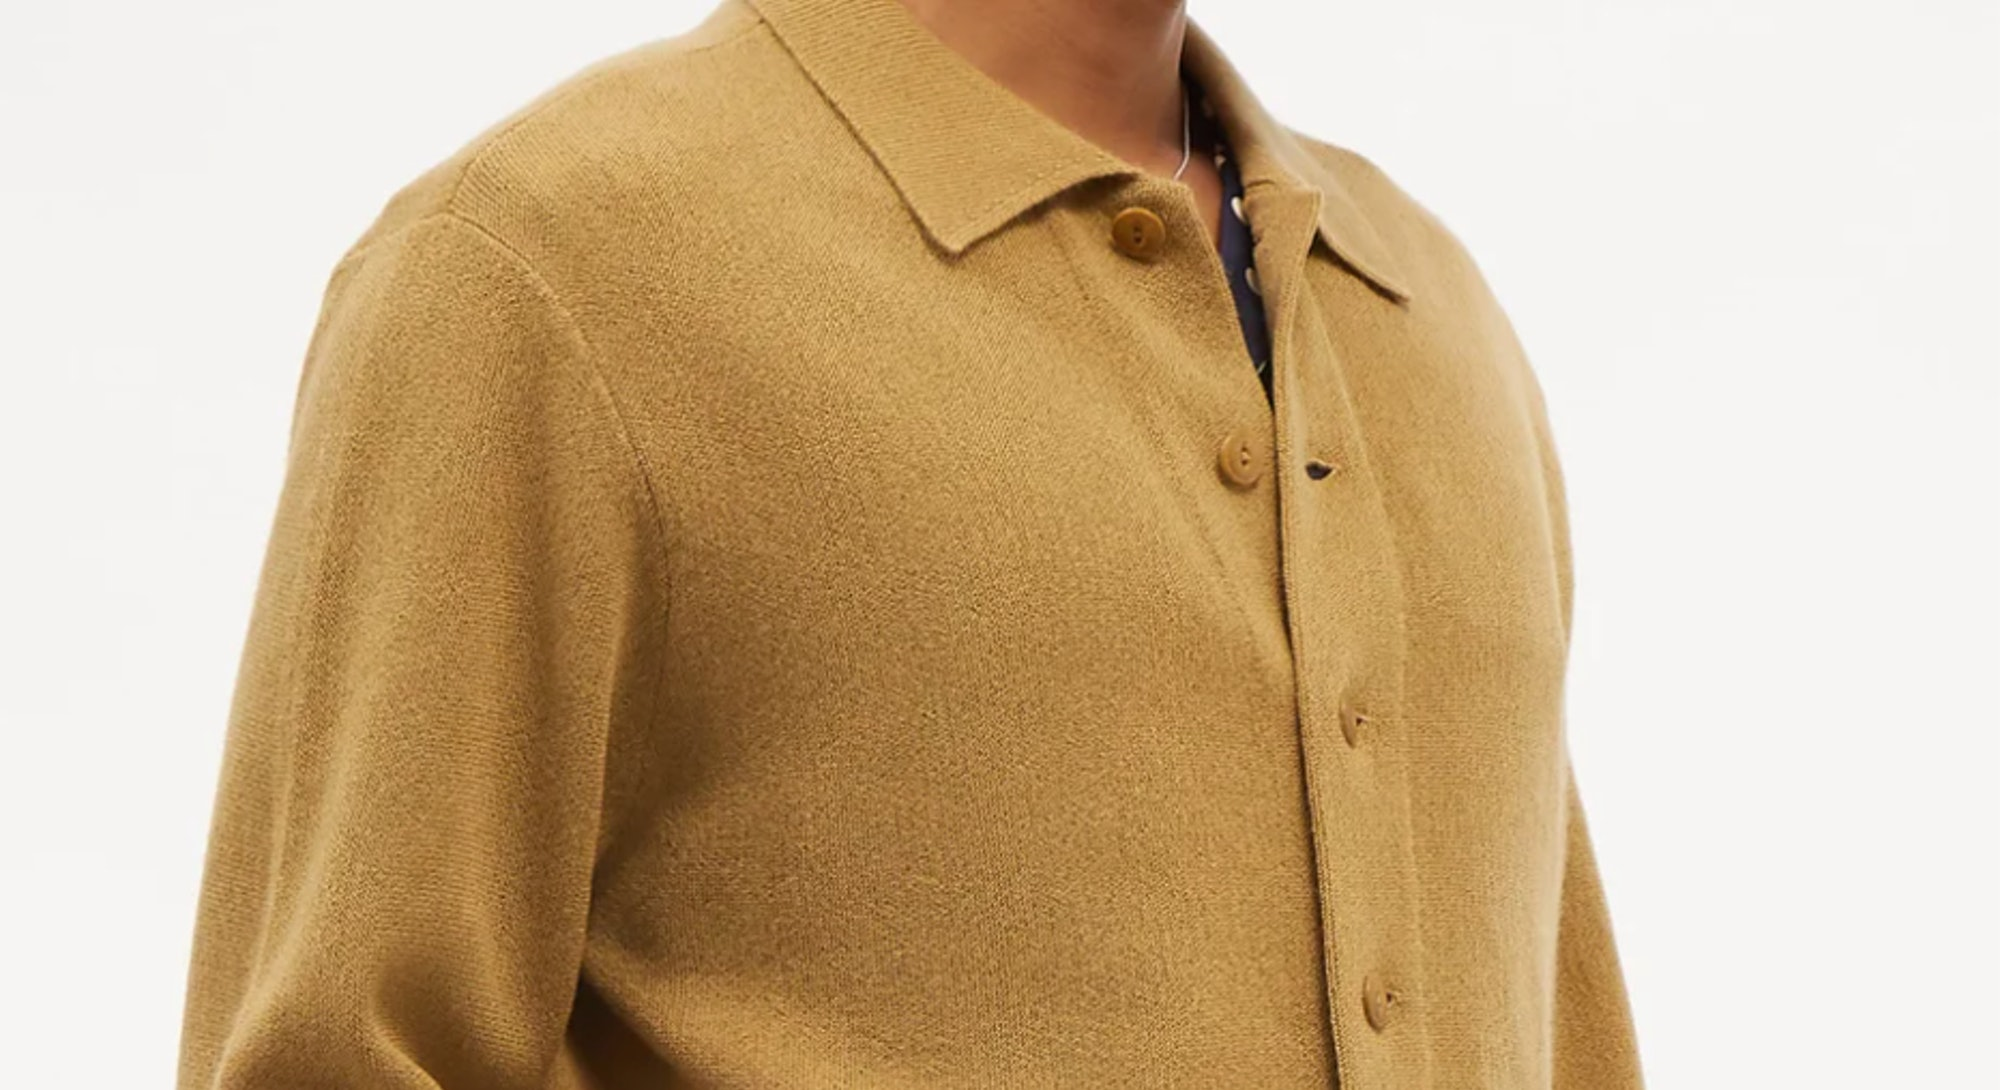 ymc collared knit cardigan